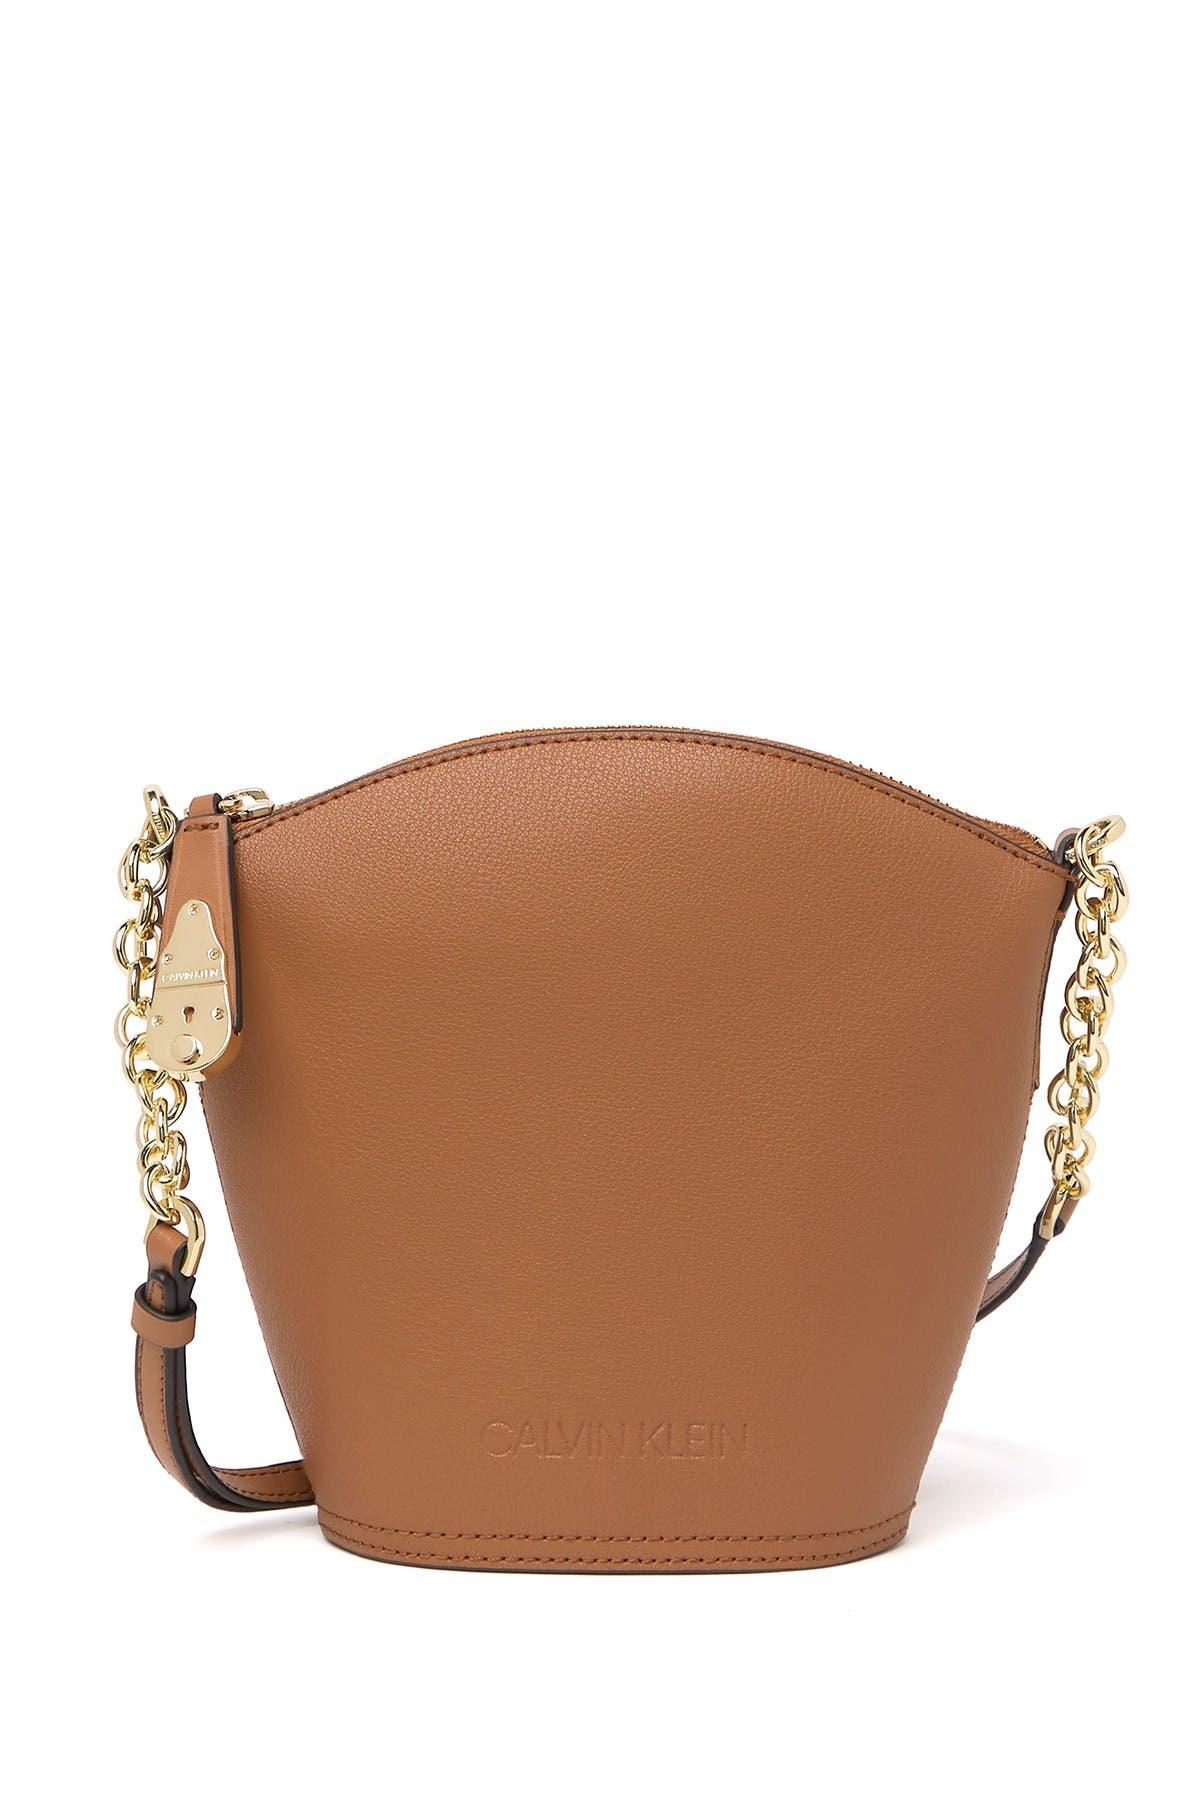 Image of Calvin Klein Daytonna Leather Bucket Crossbody Bag